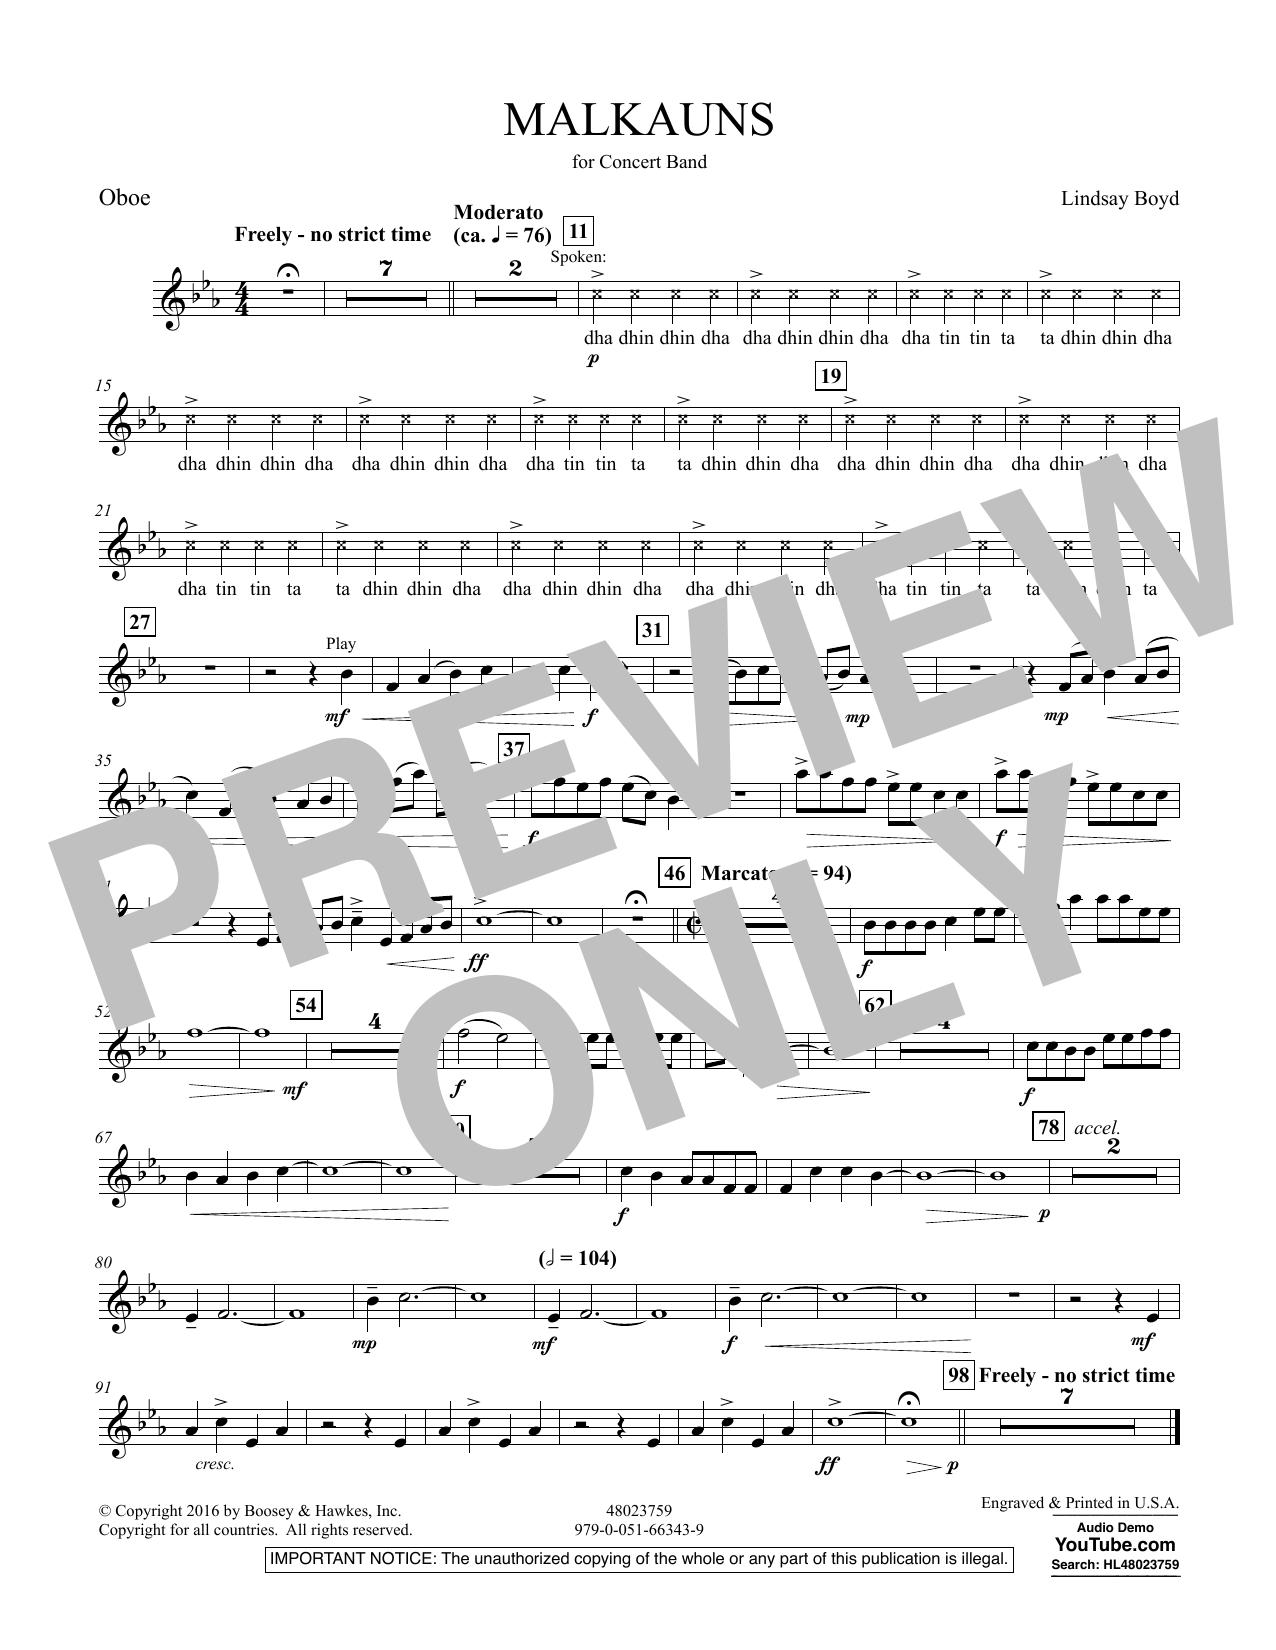 Malkauns - Oboe